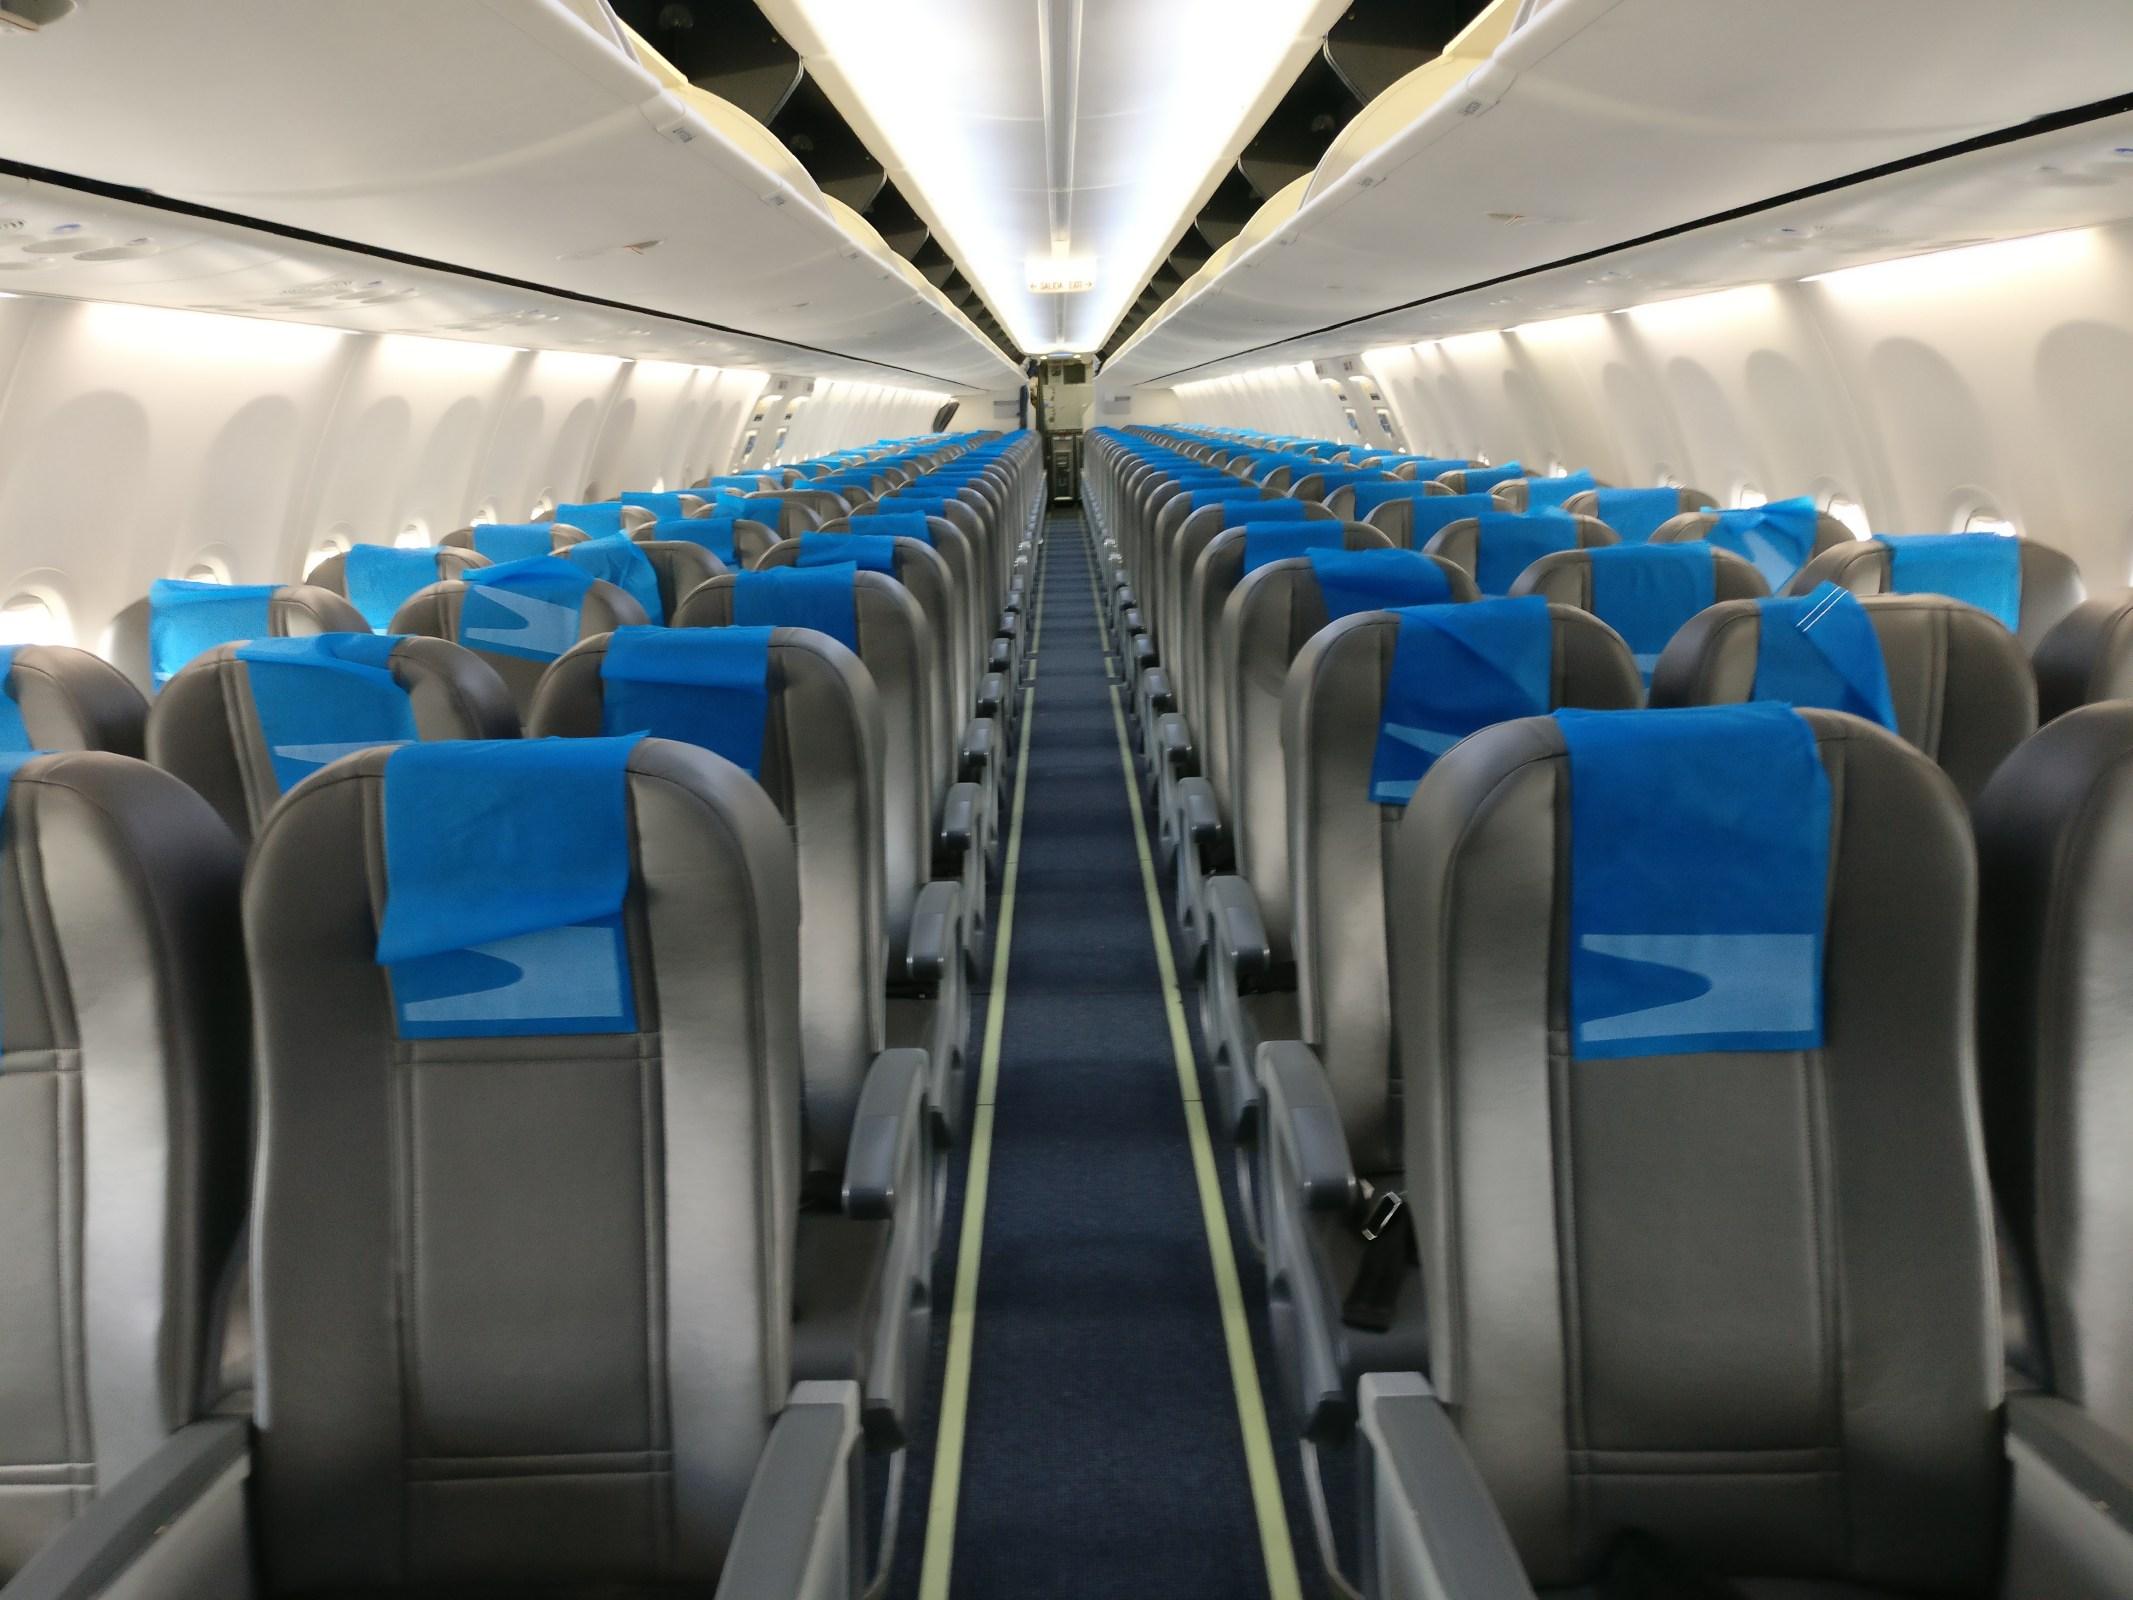 Aerolineas Argentinas Economy Class Boeing 737-800 Seating